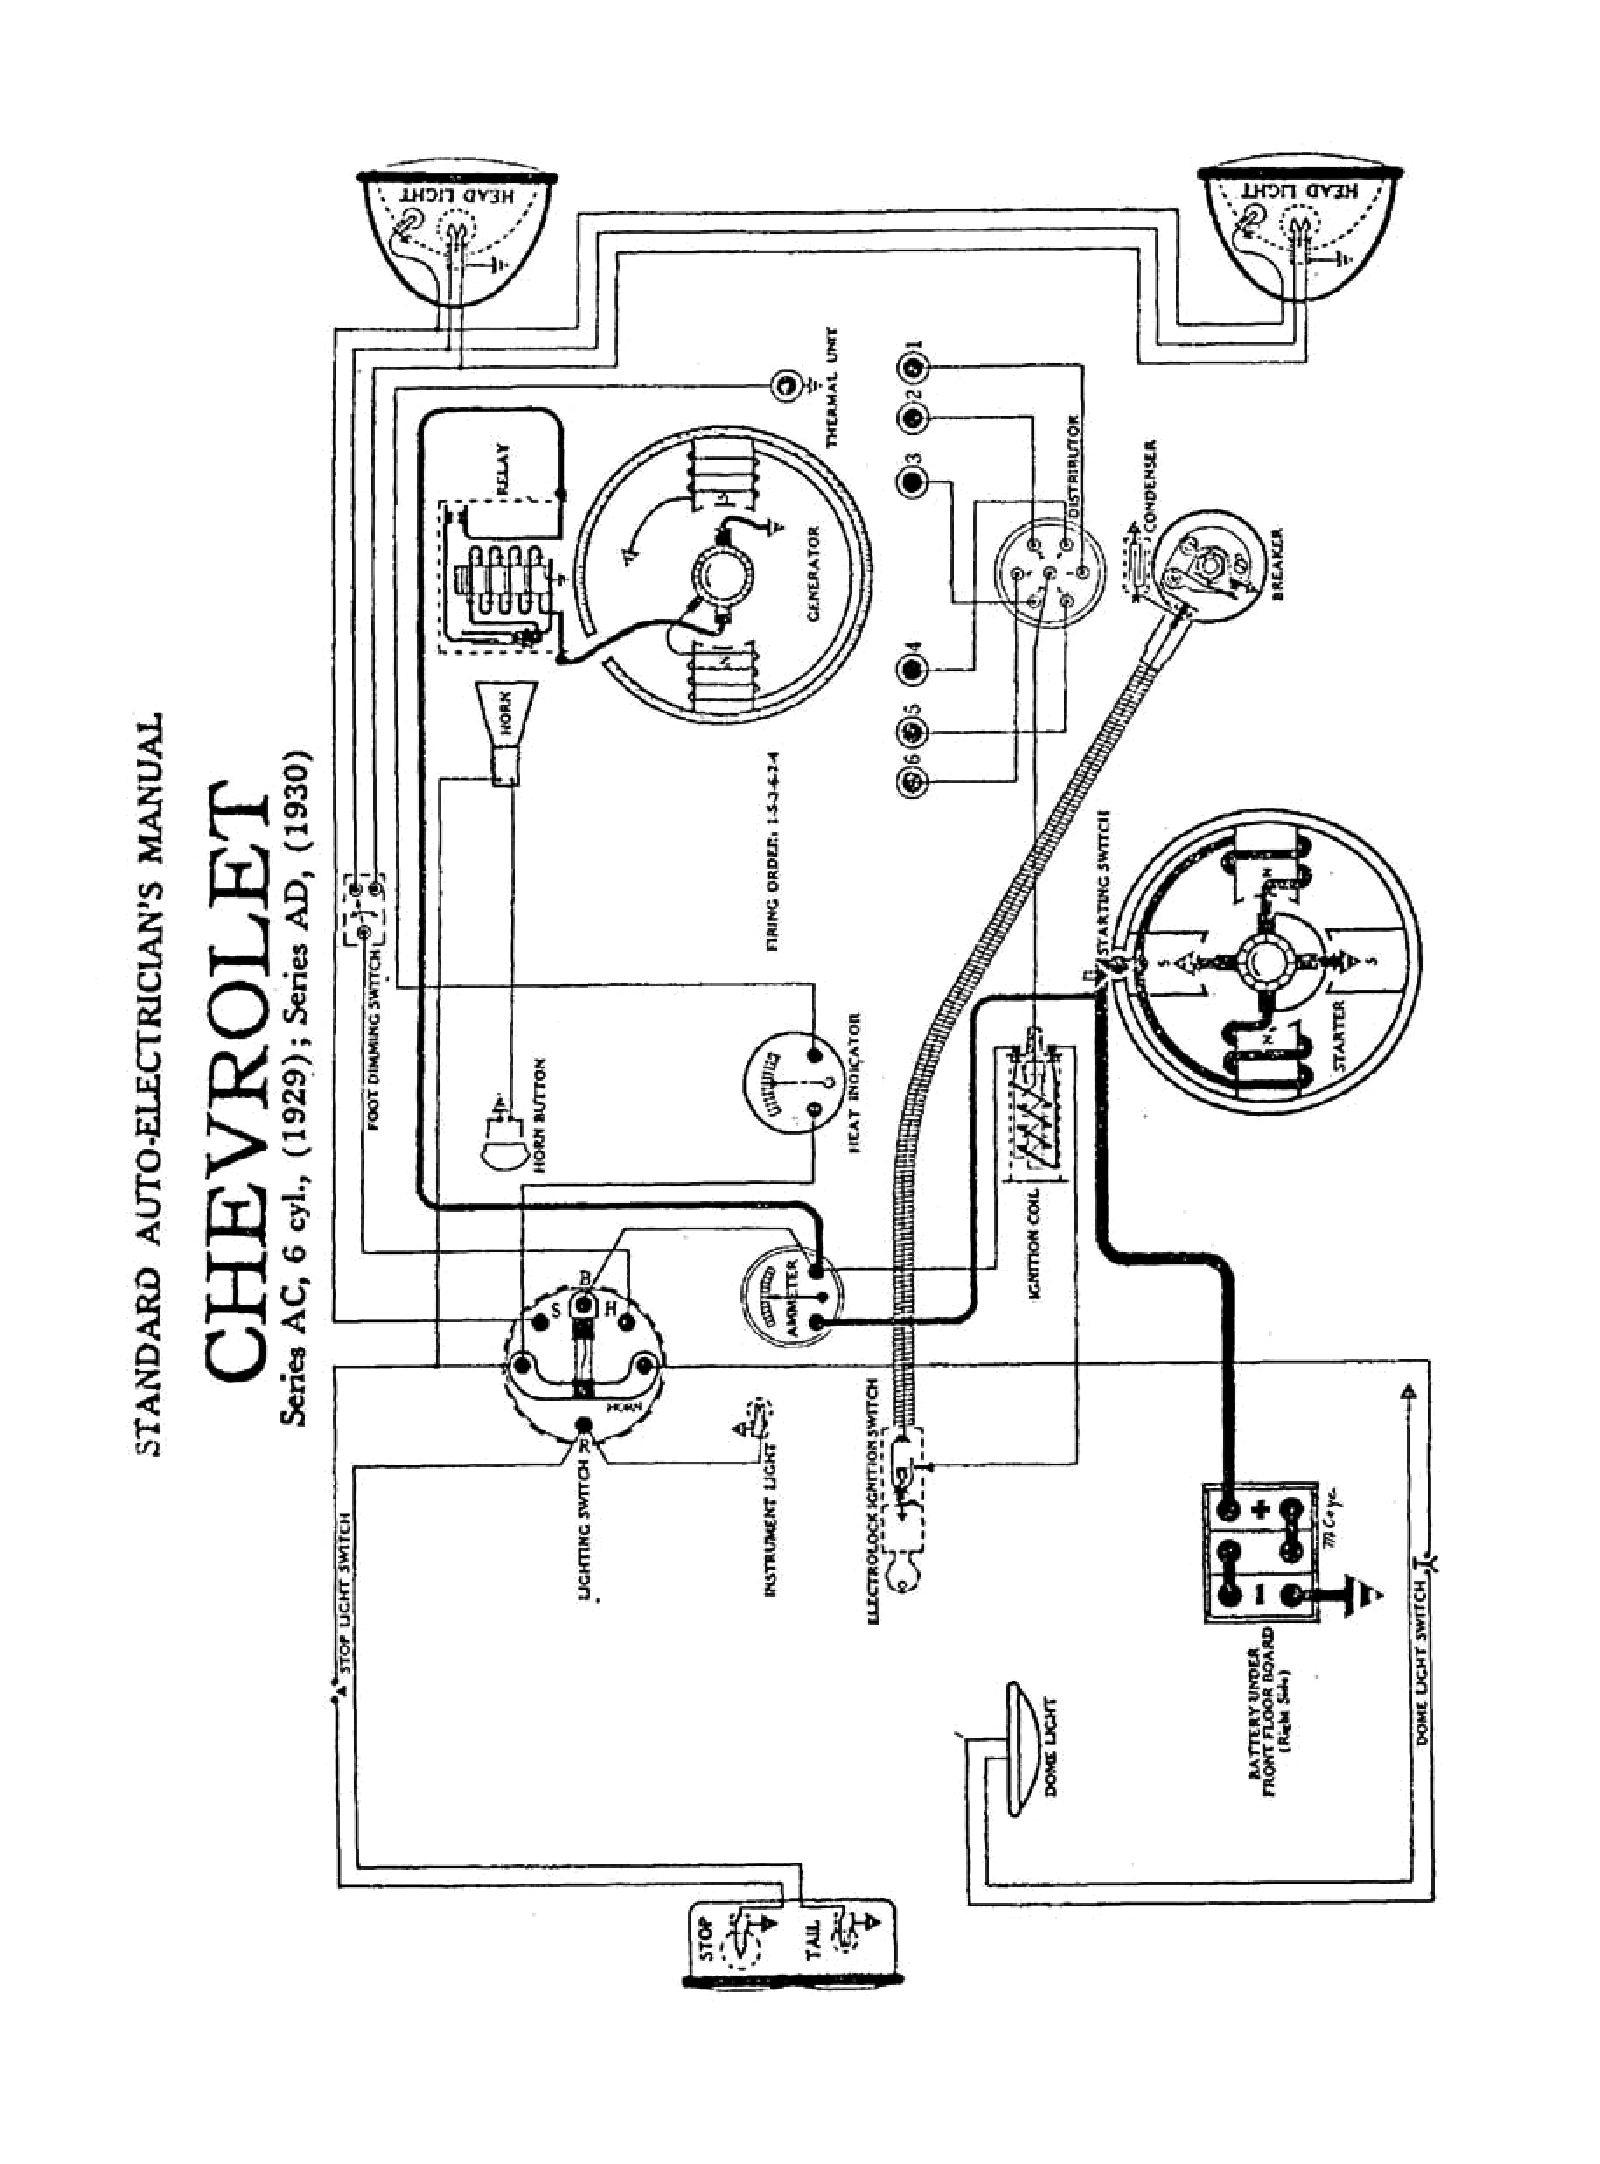 1928 Pontiac Wiring Harness - Wiring Diagrams Hubs - Model A Ford Wiring Diagram